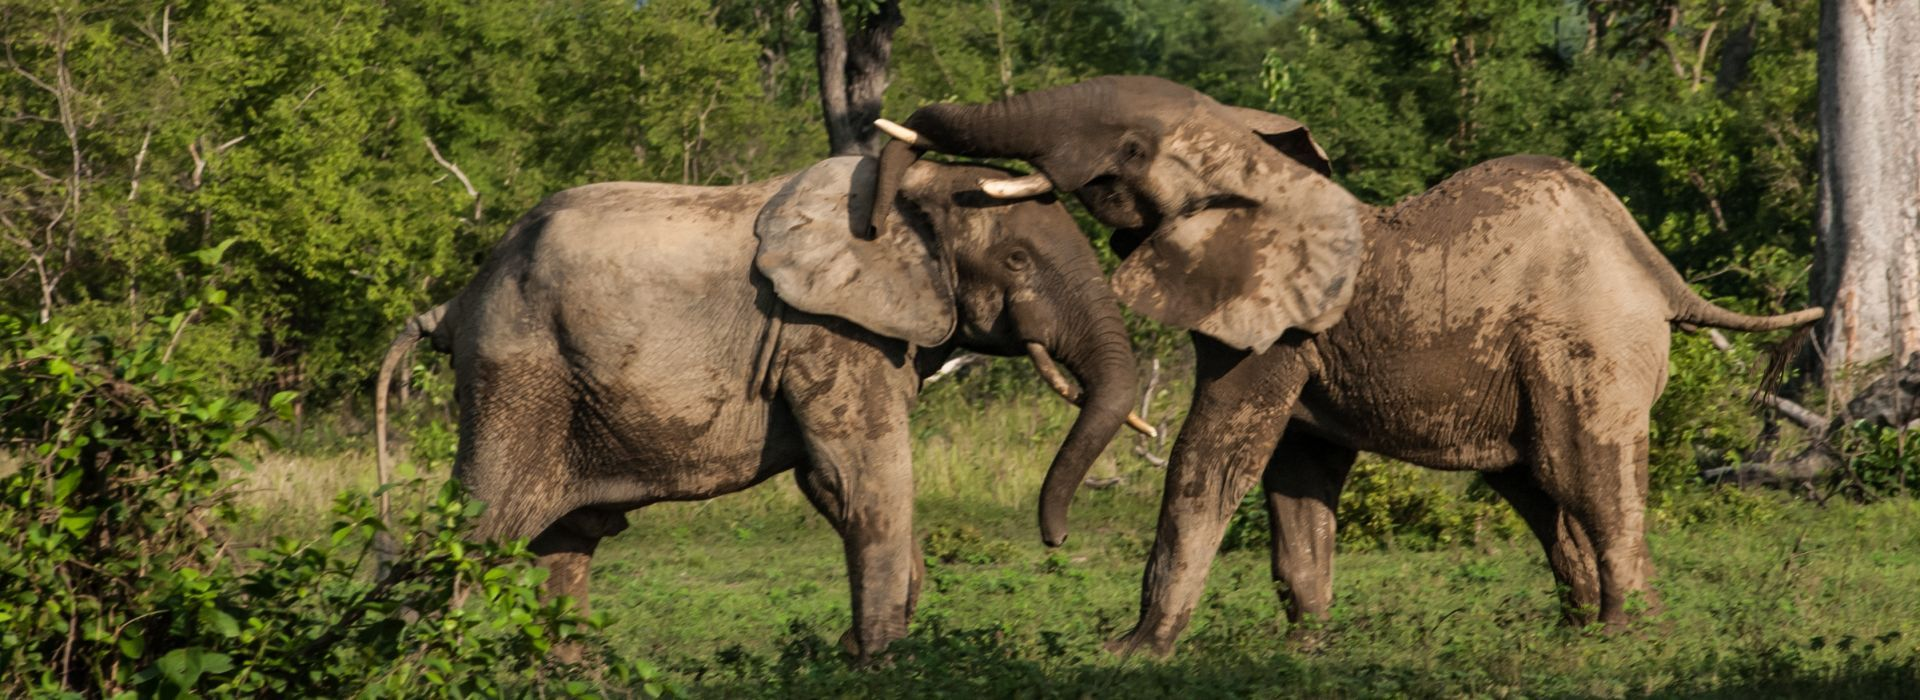 Wildlife Tours in Ghana